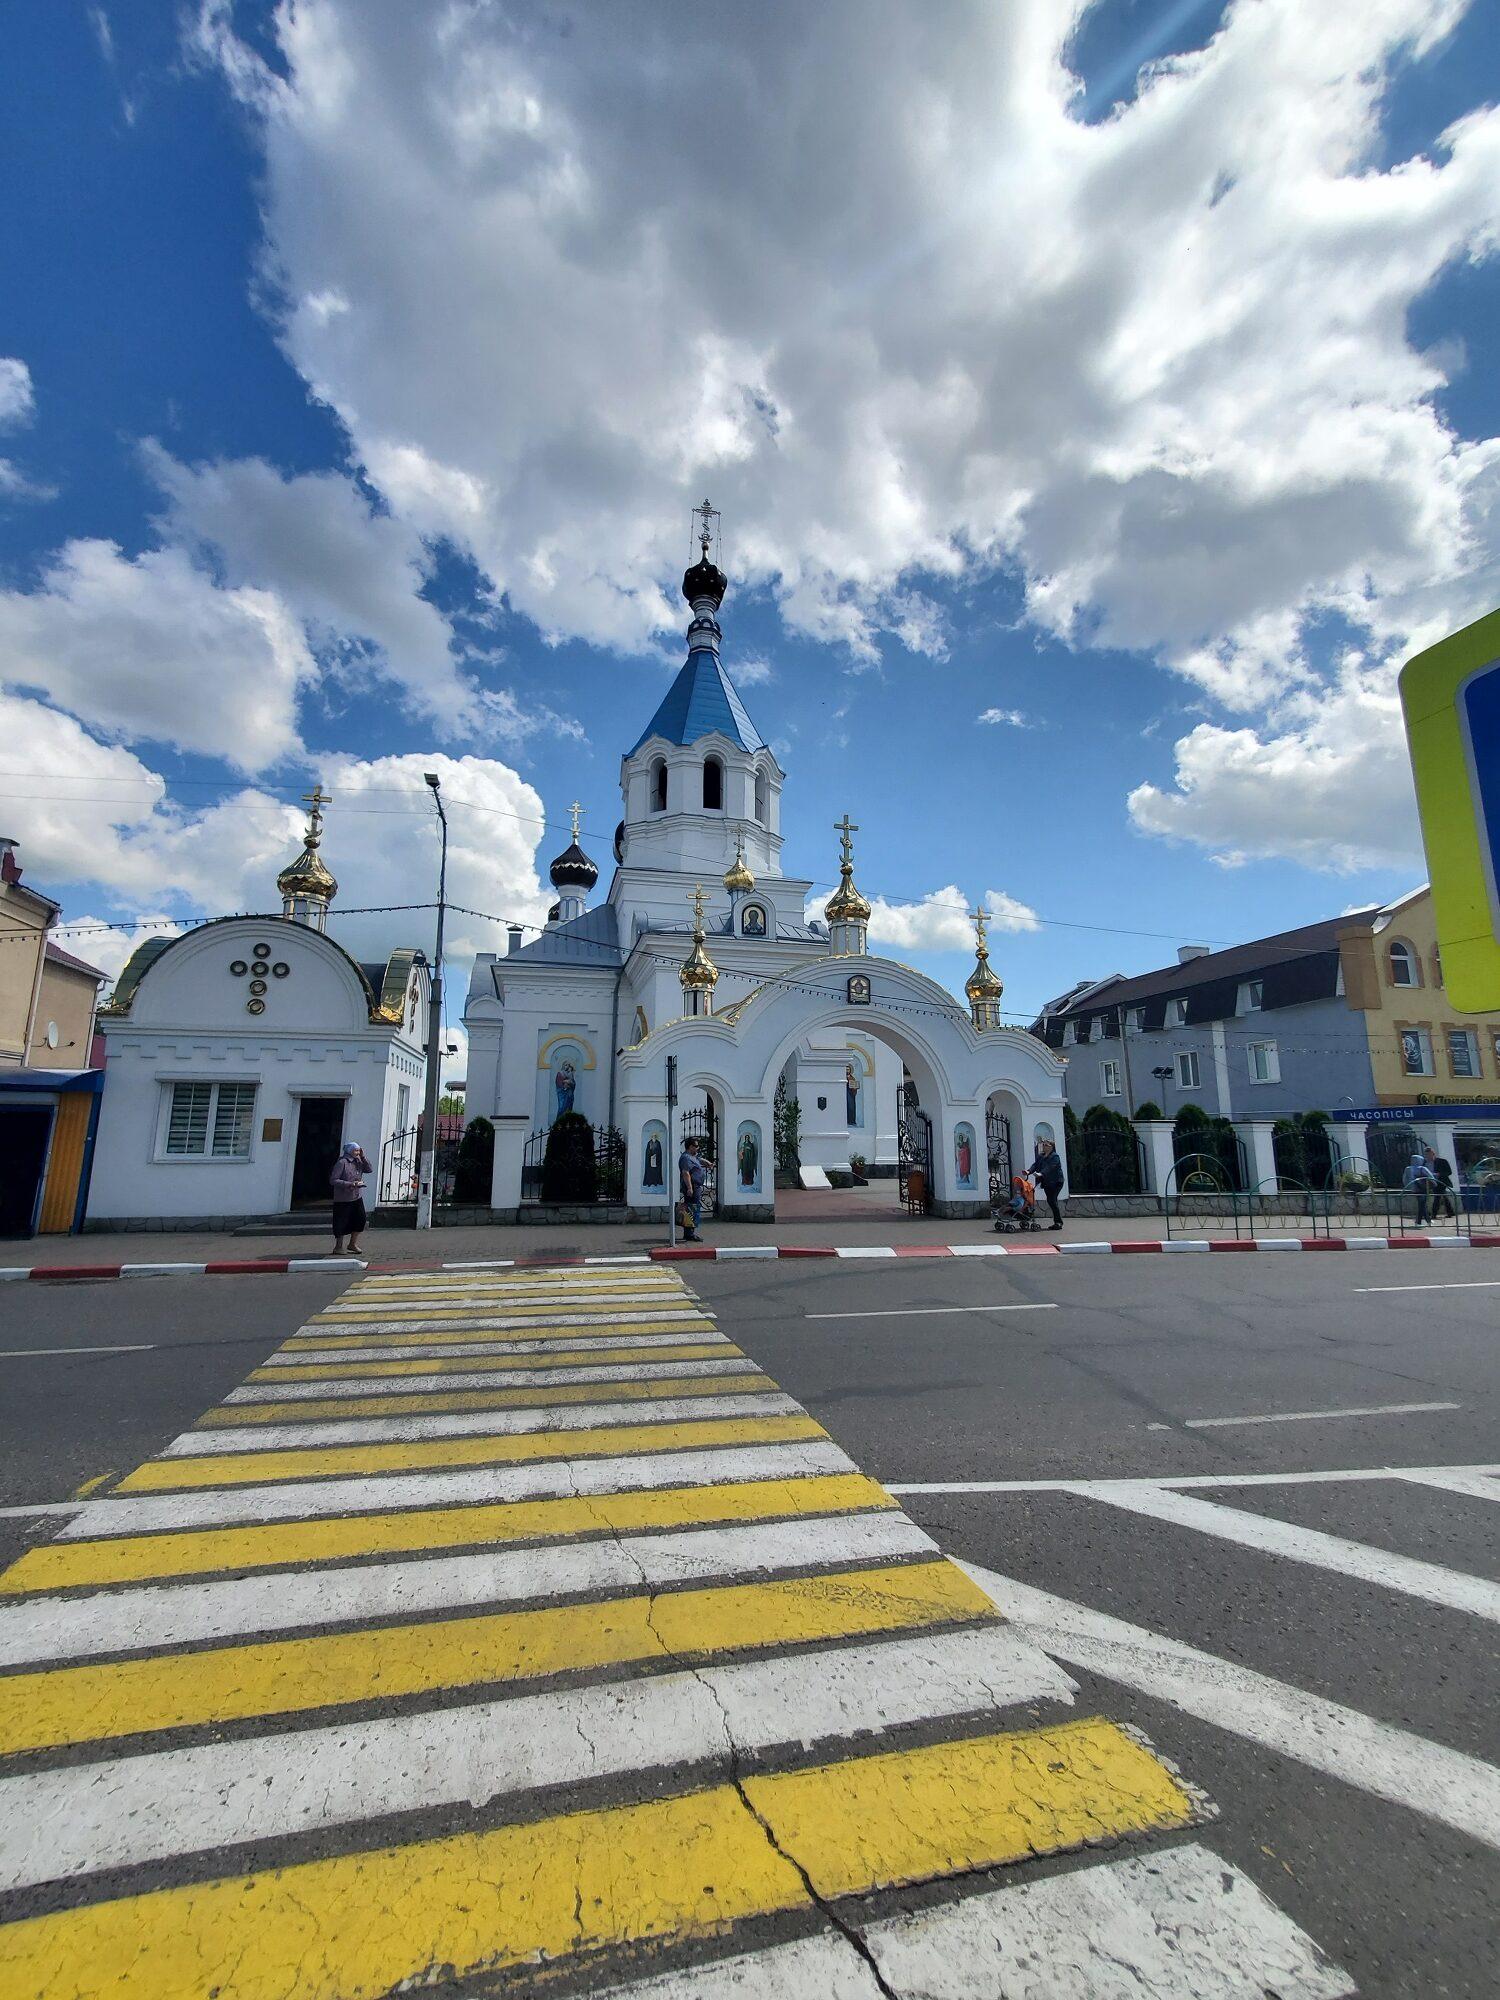 20200606 123157 rotated - Храм Николая Чудотворца в Поставах